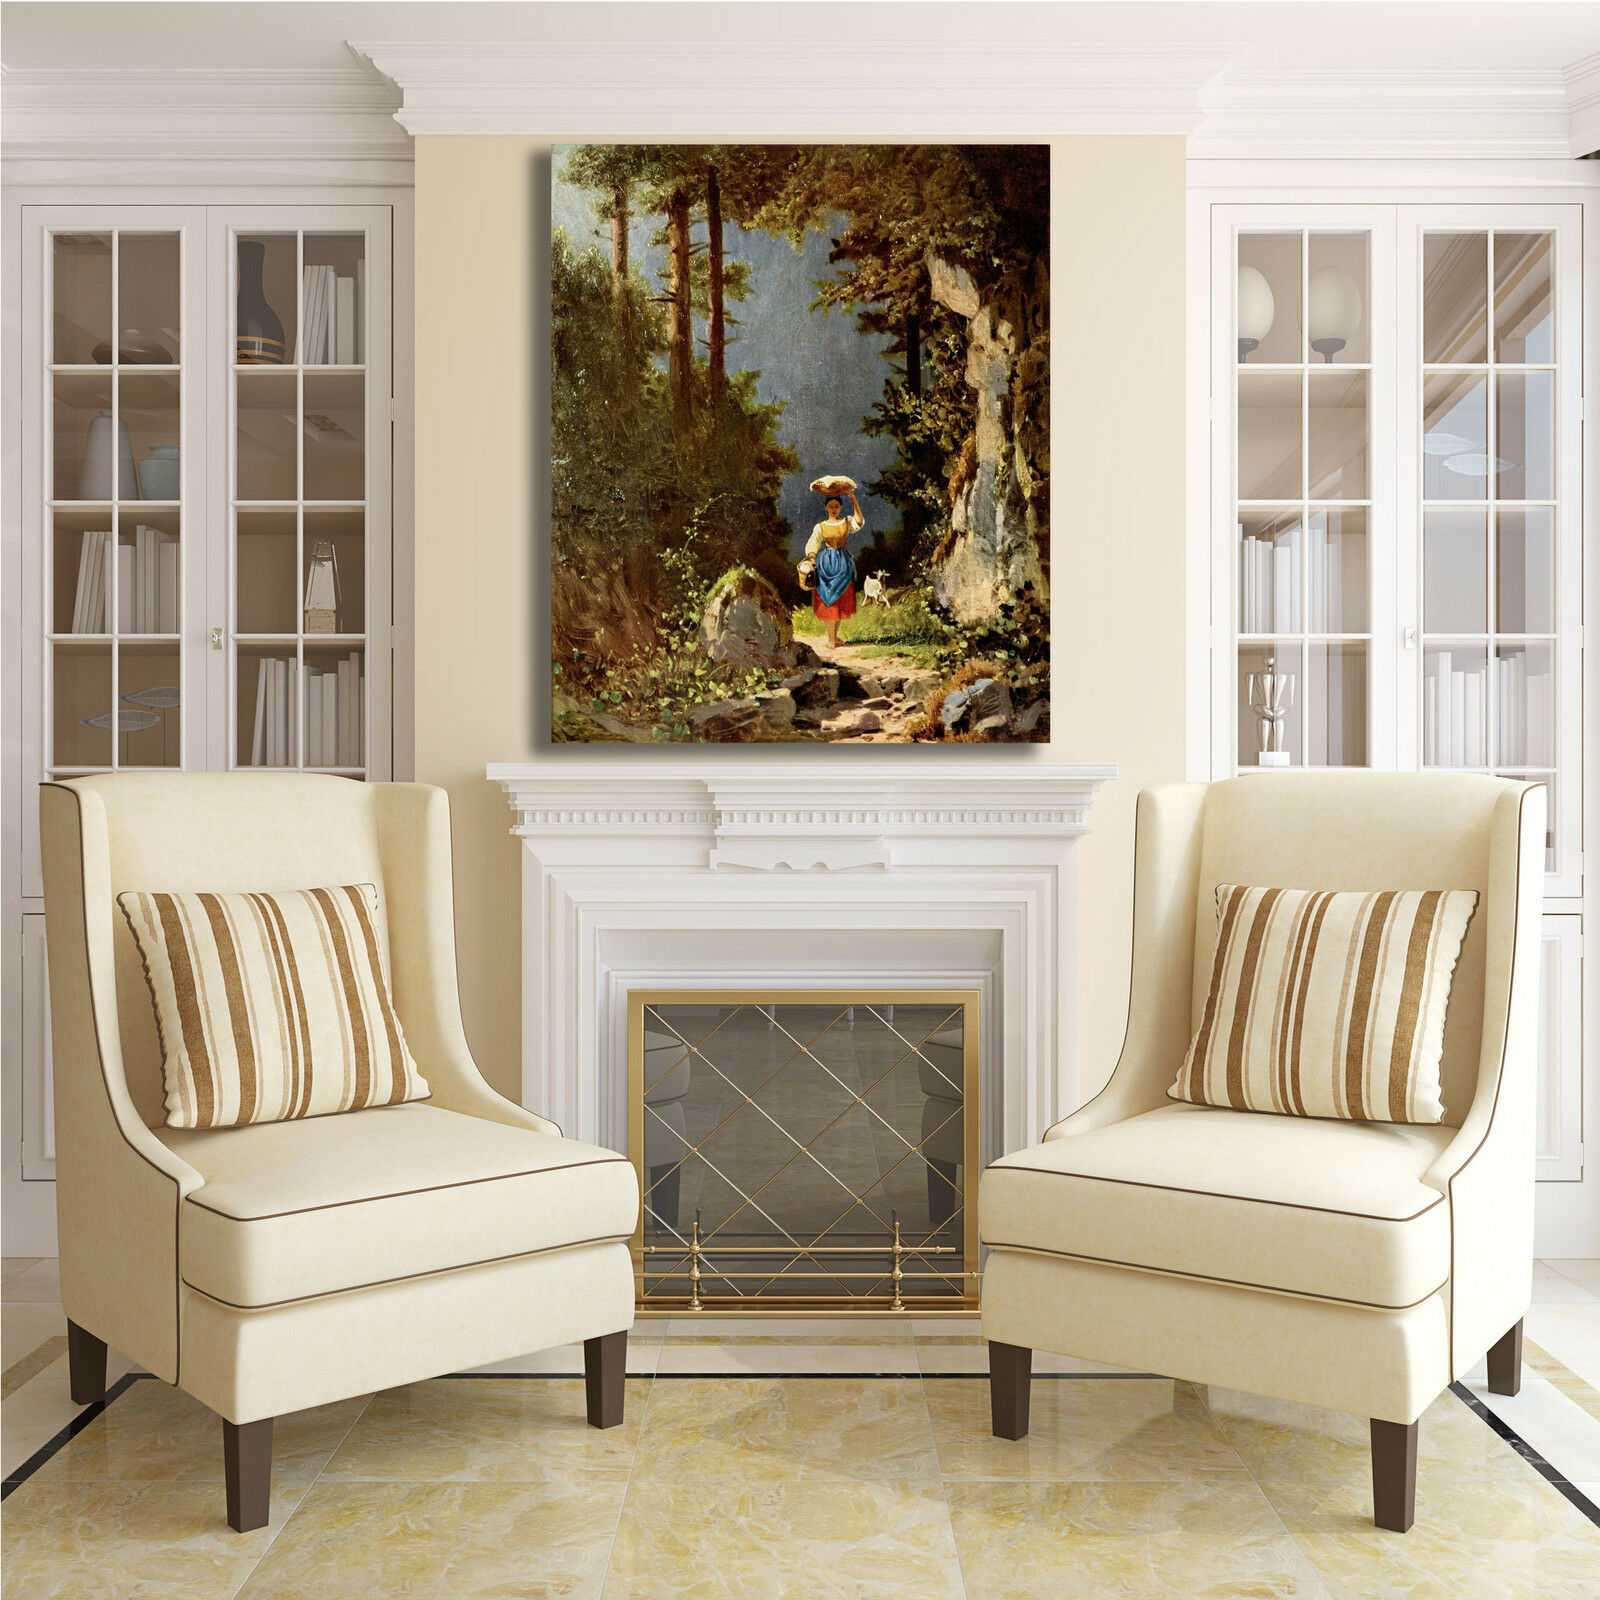 Spitzweg ragazza con con con capra design quadro stampa tela dipinto telaio arRouge o casa eb66bb